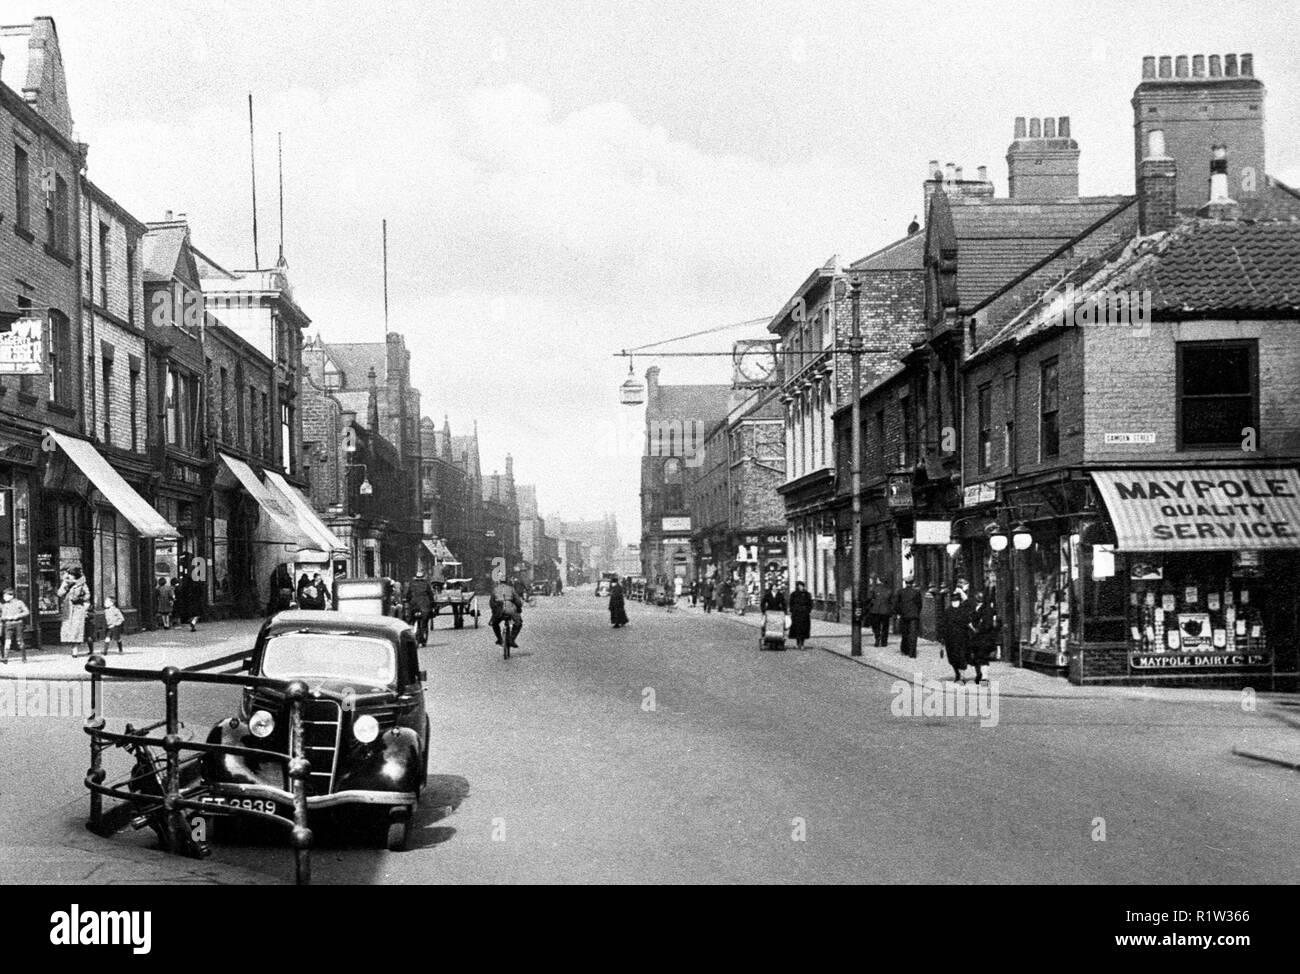 Saville Street, North Shields 1920's - Stock Image